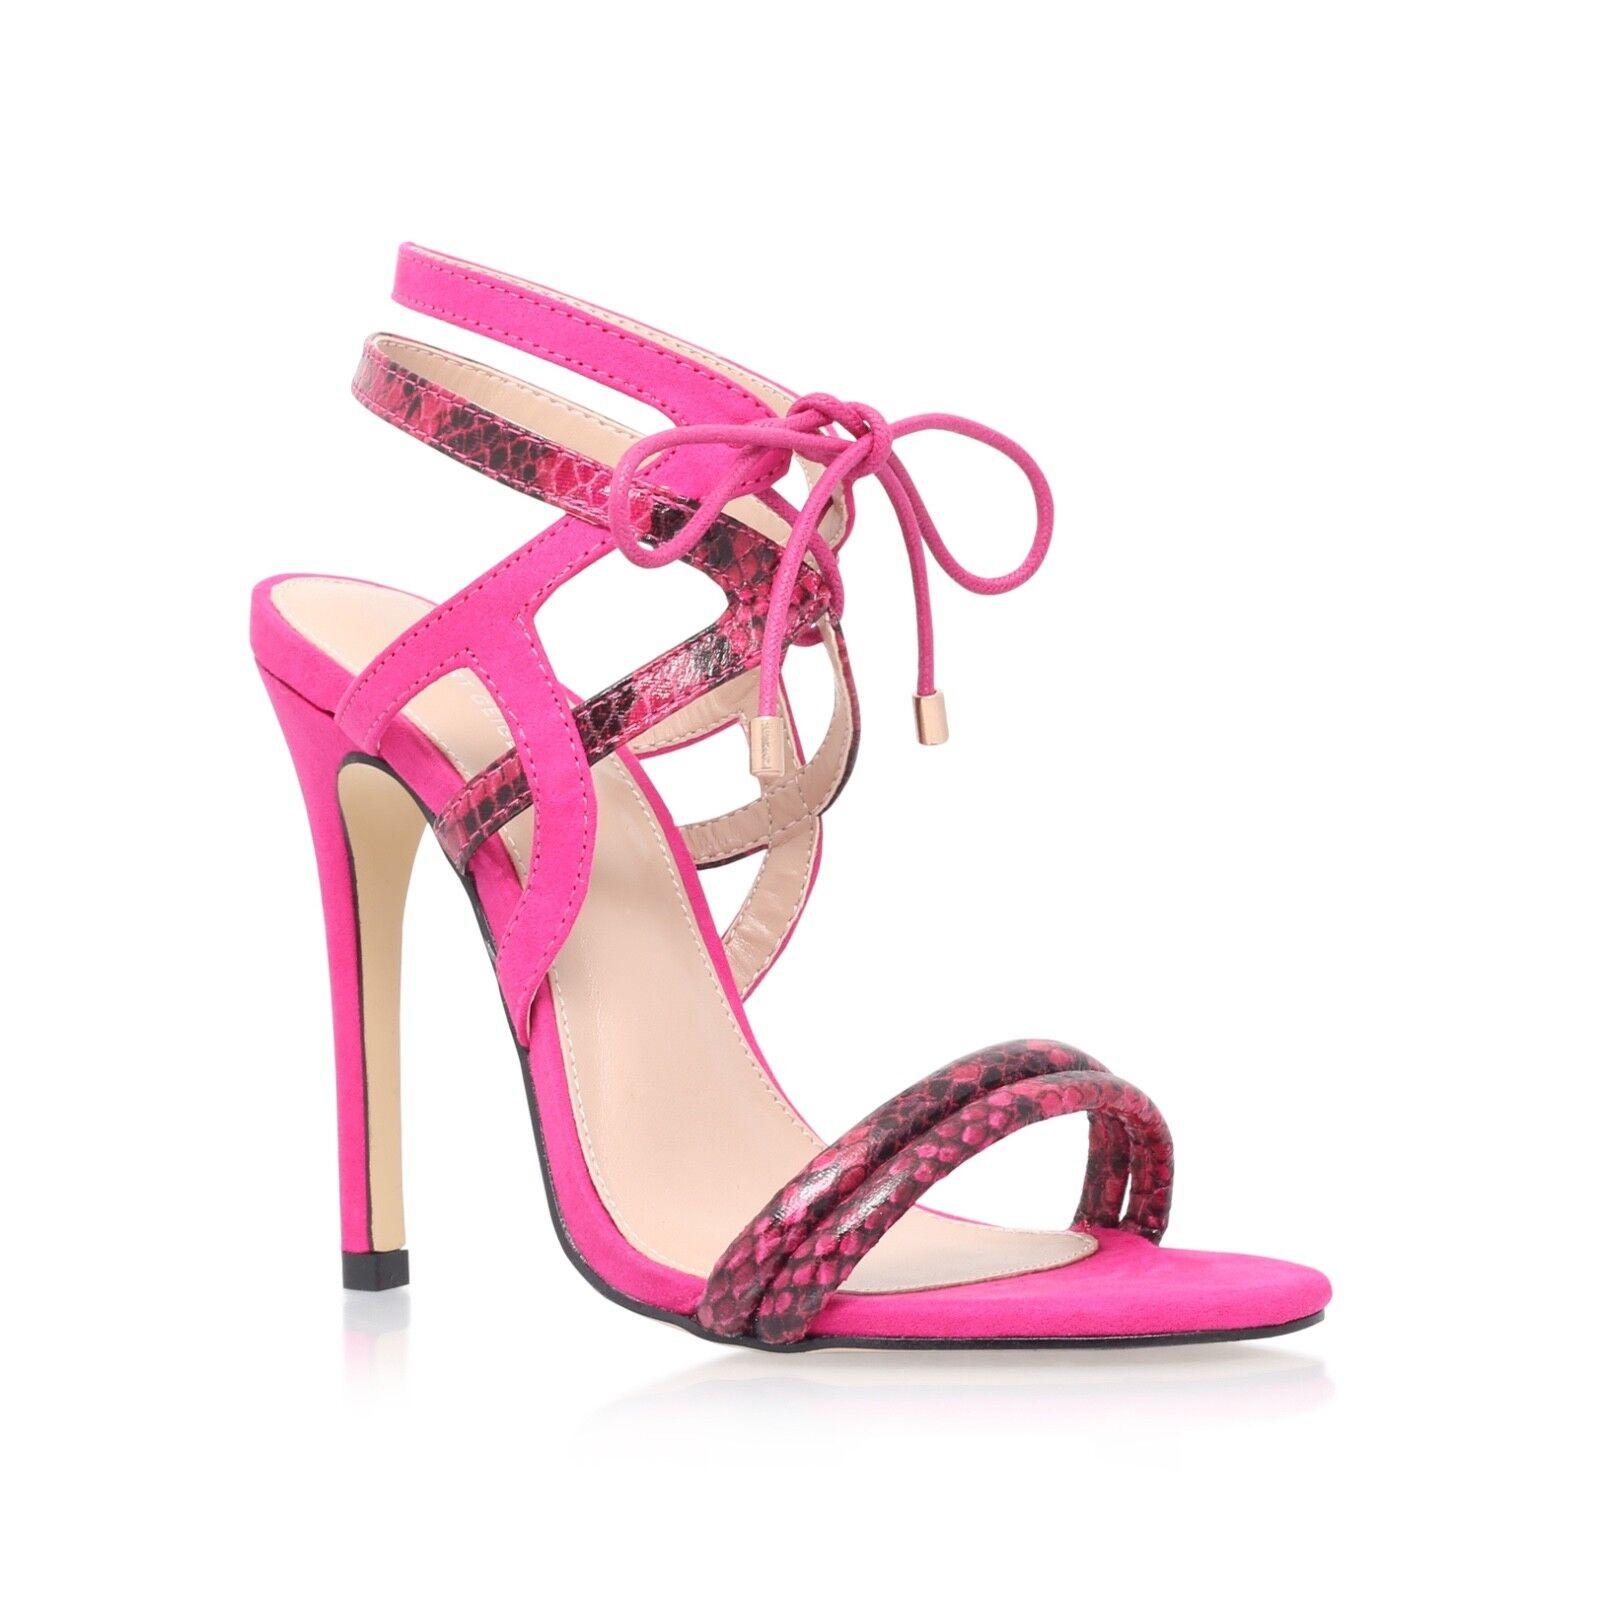 Kurt Geiger Carvela Carvela Carvela Rosa Strappy Sandals Größe 7 EU 40 New Party schuhe 72324a